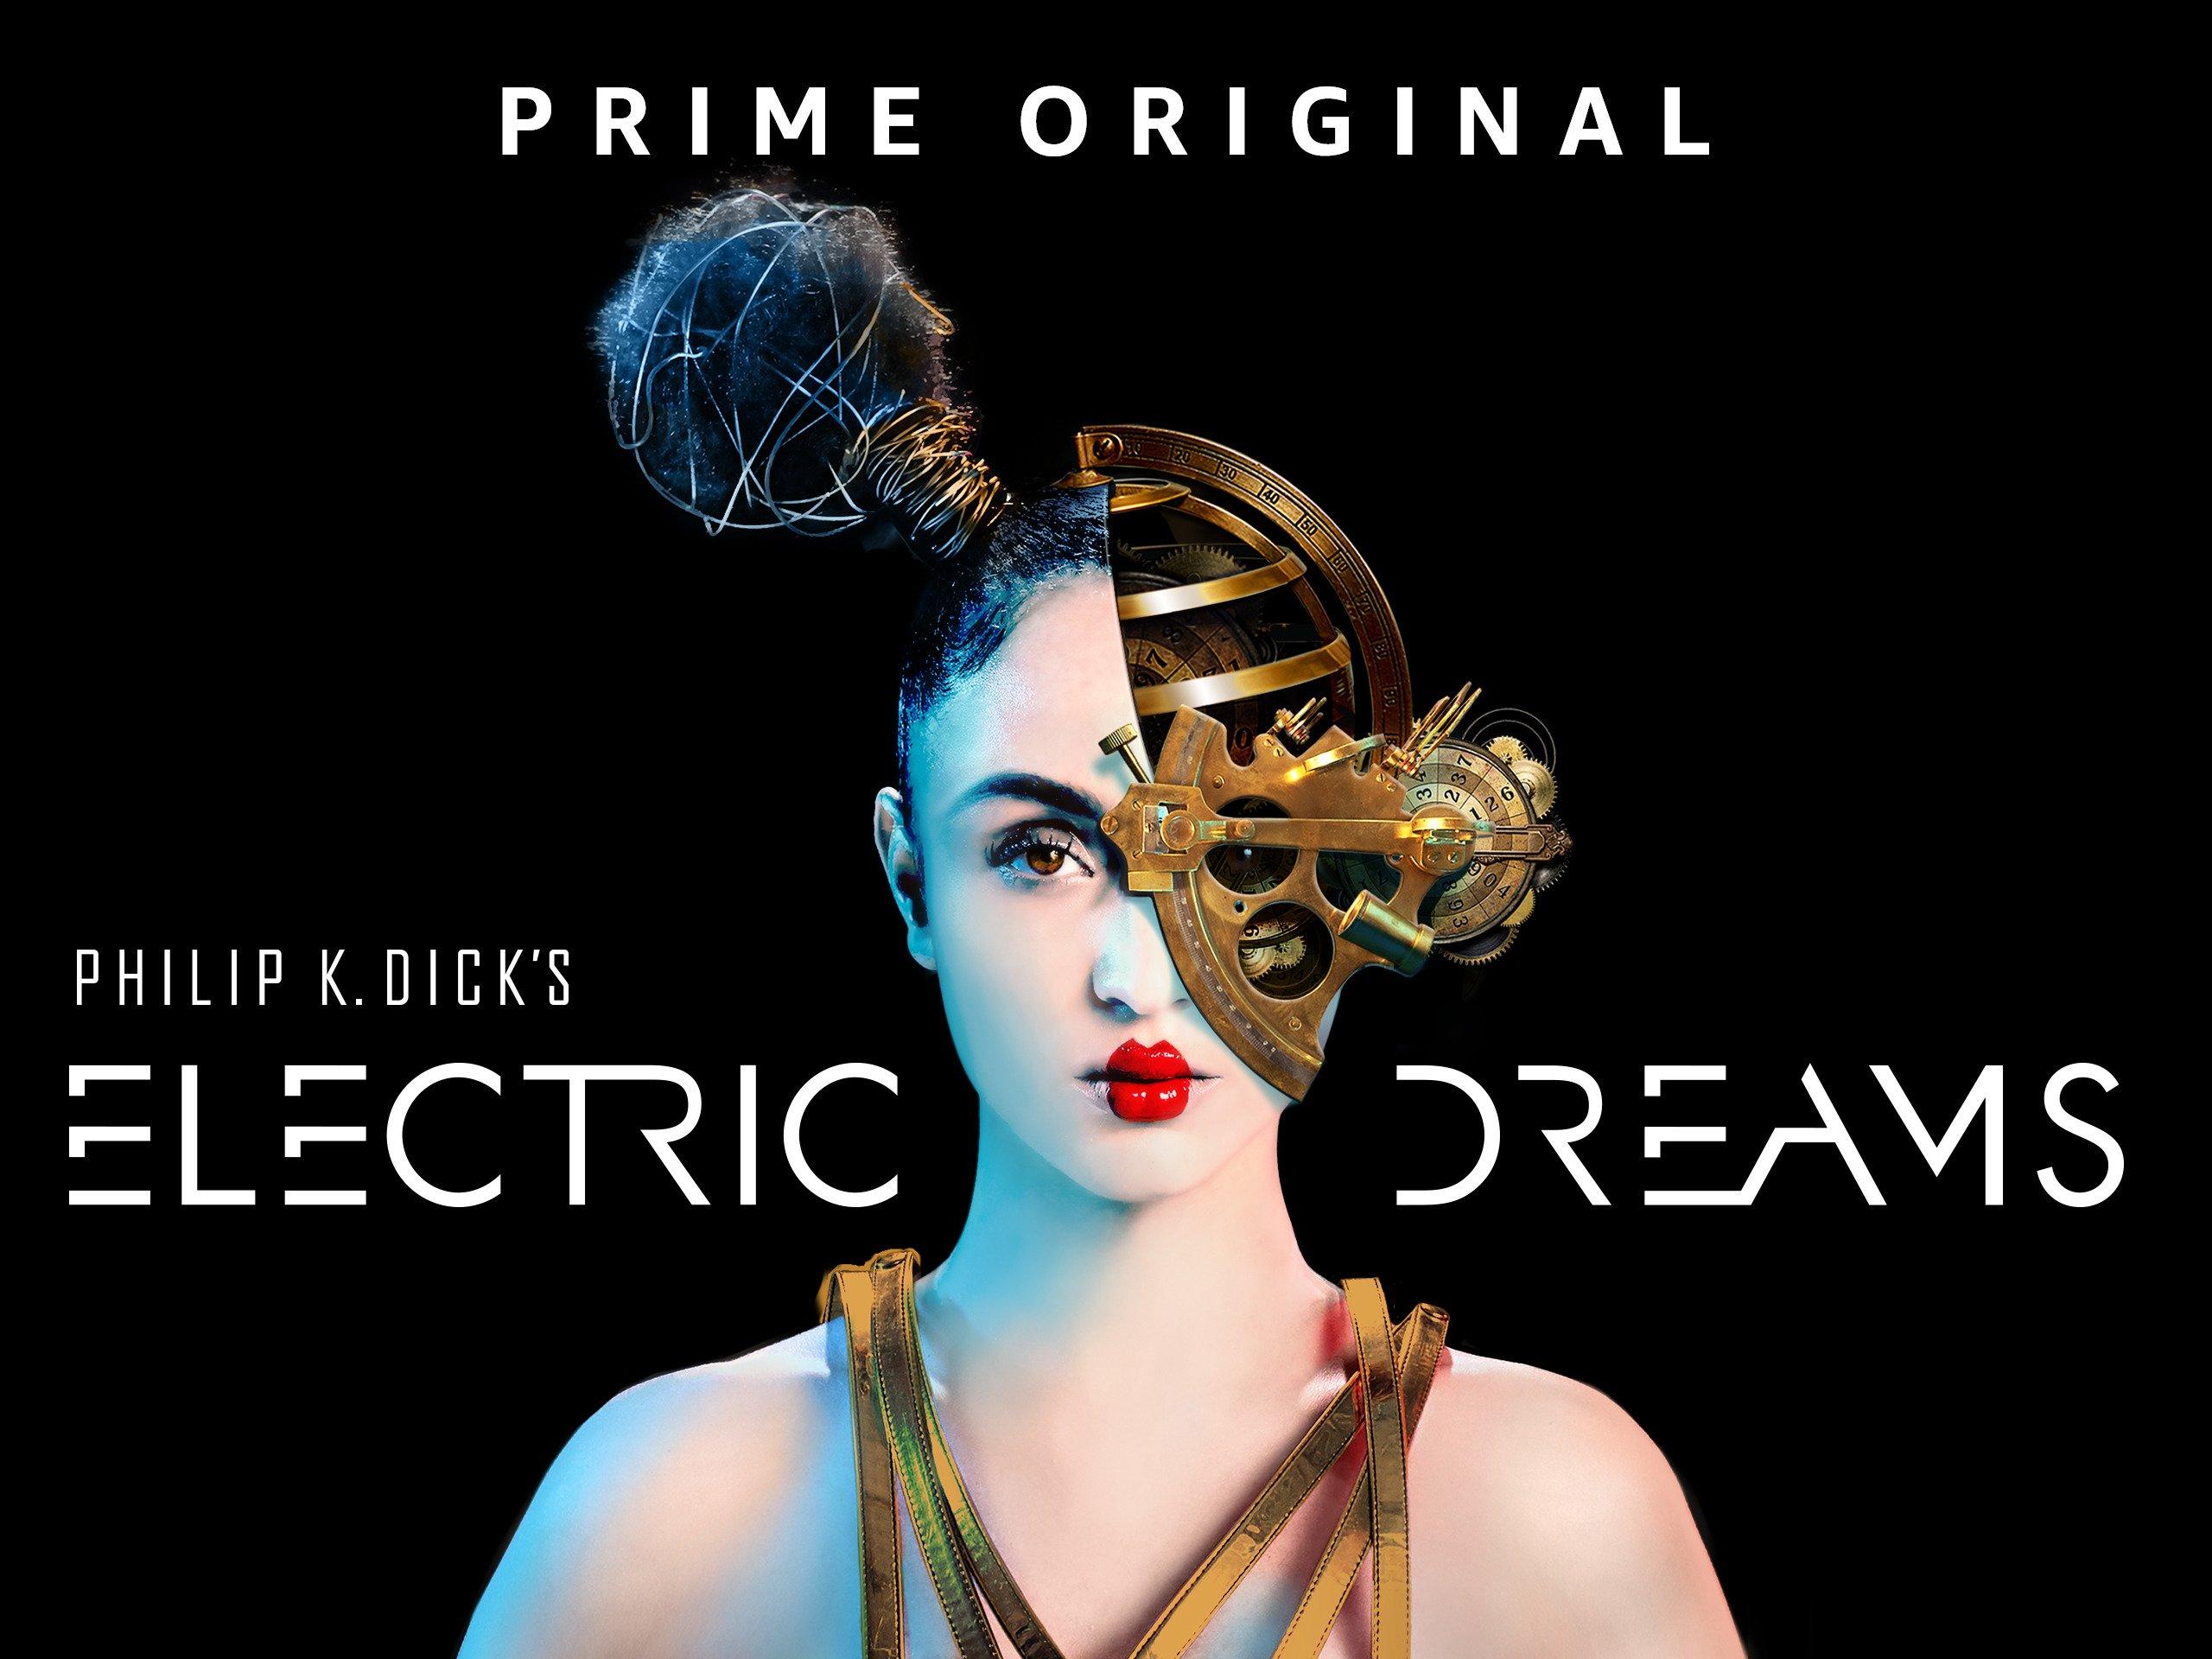 Amazon.com: Watch Philip K. Dick's Electric Dreams - Season 1 | Prime Video